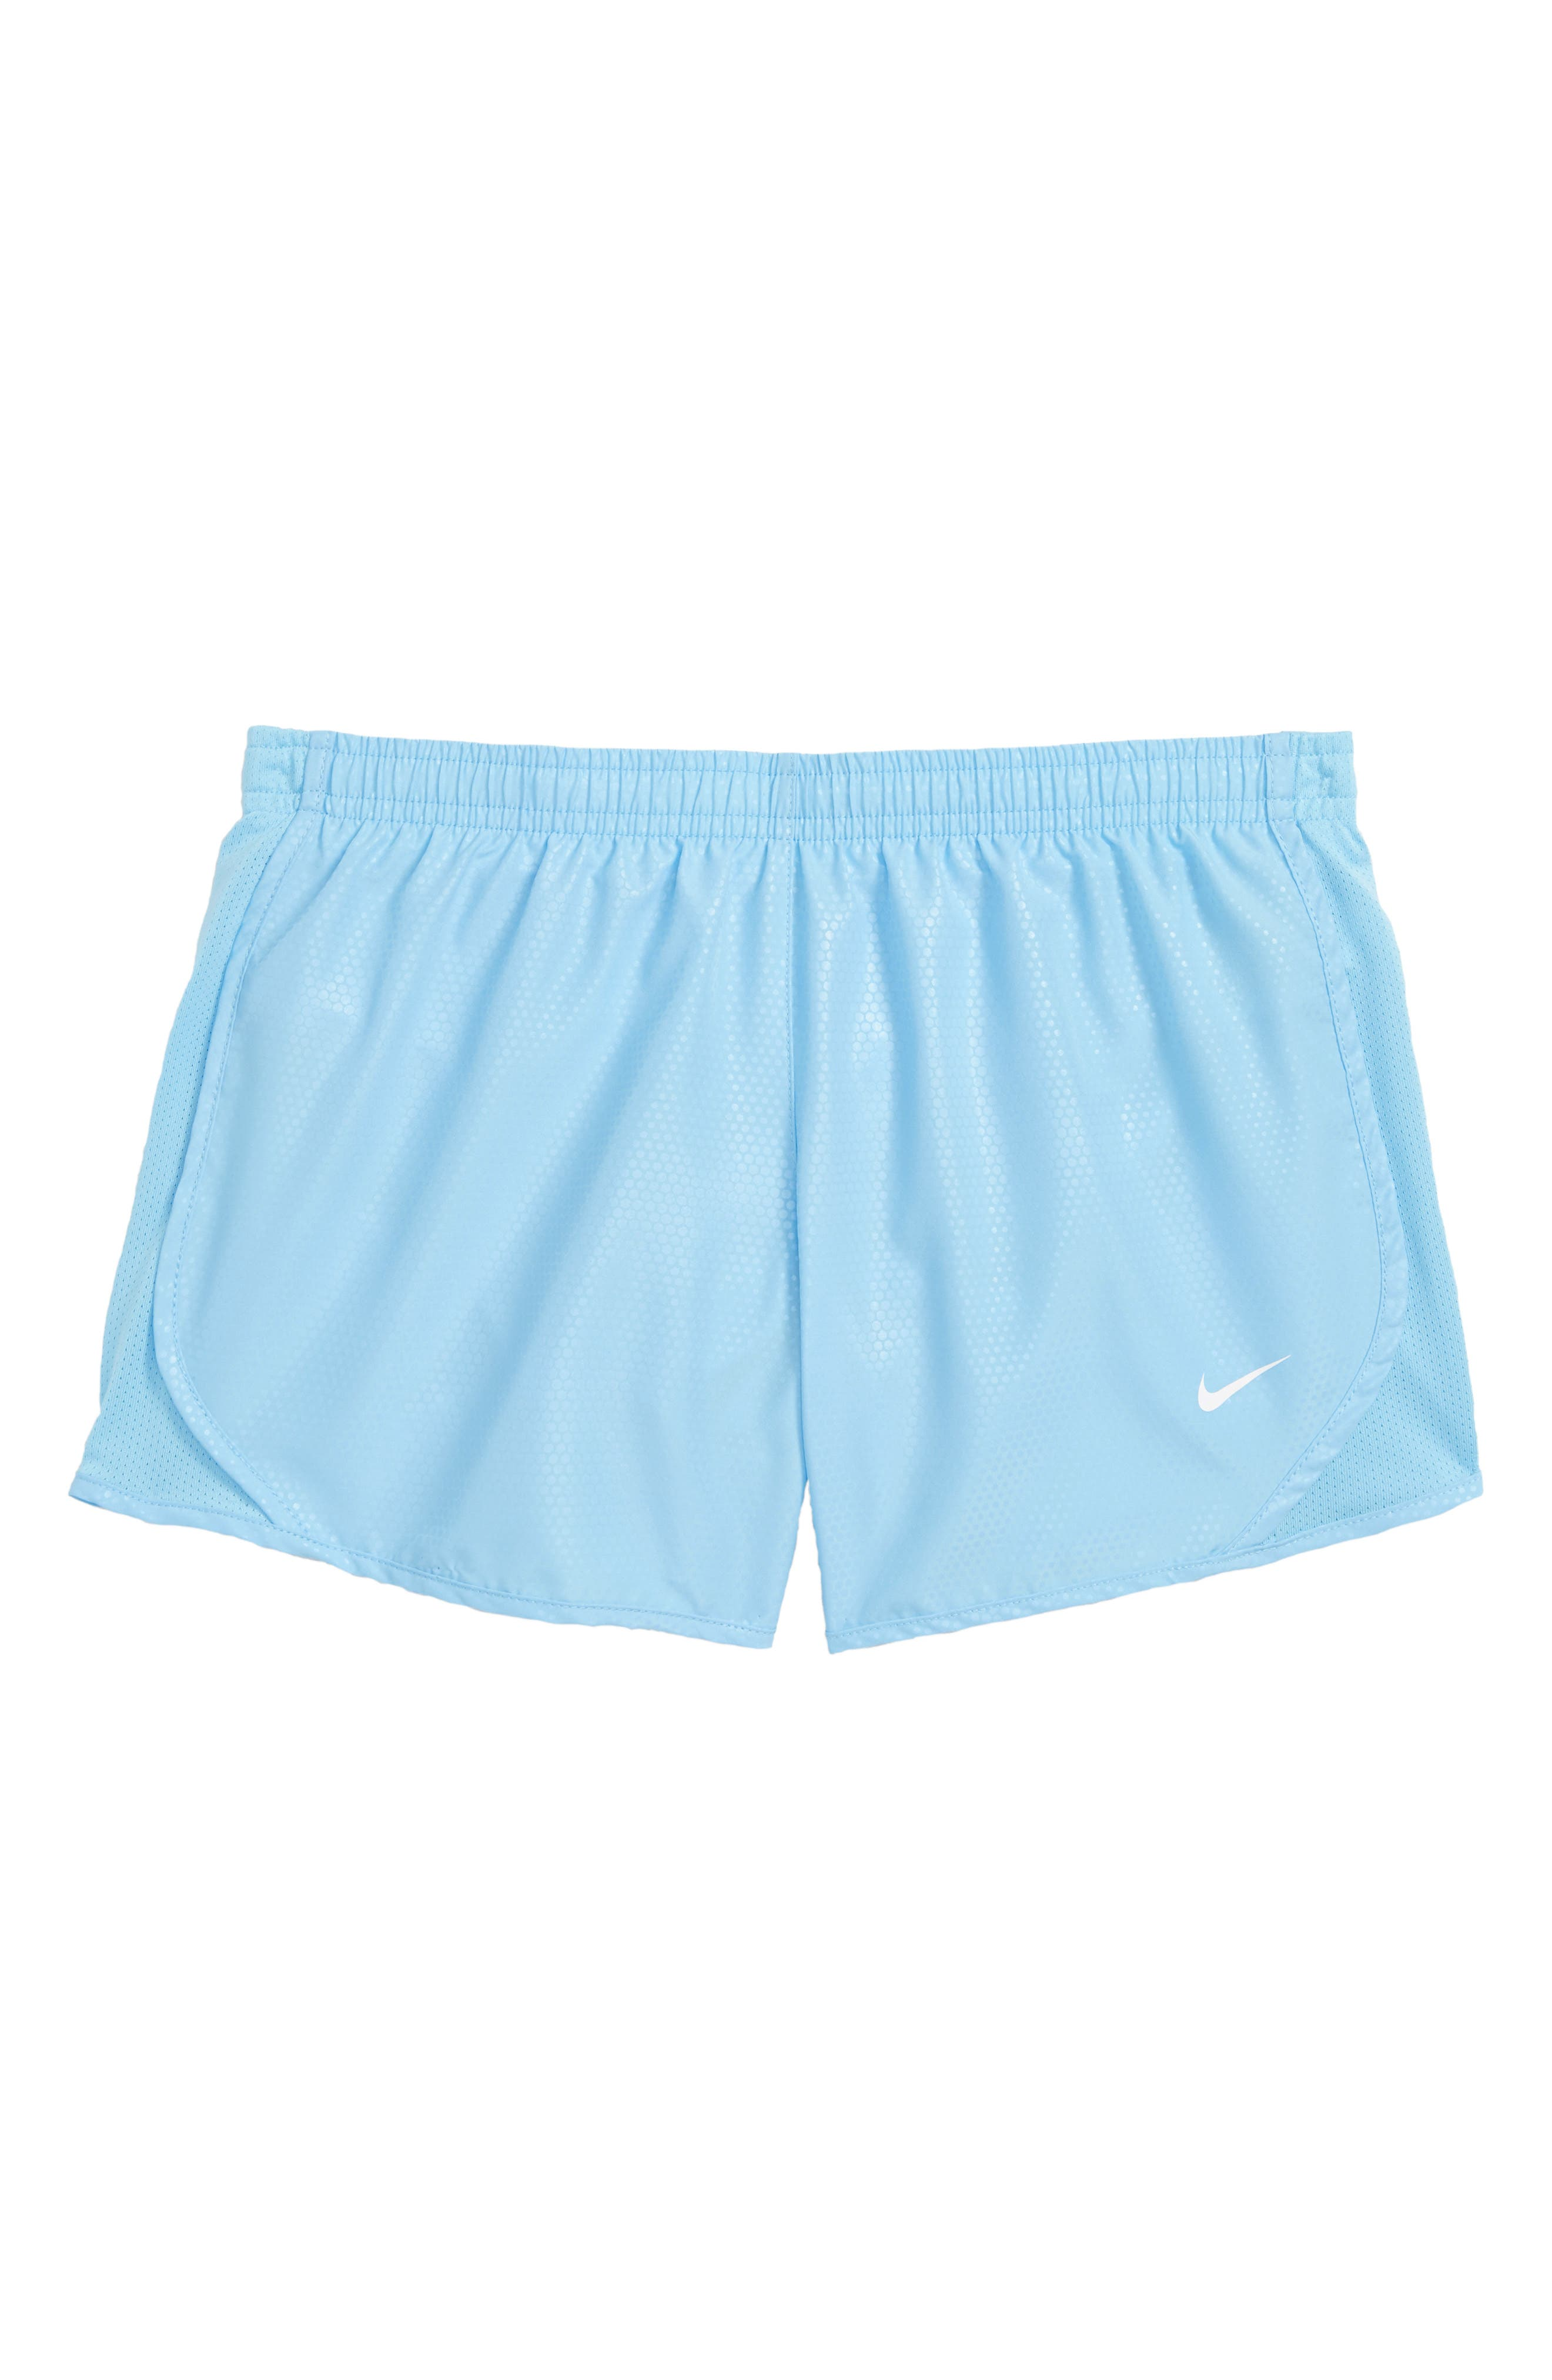 Dry Tempo Shorts,                             Main thumbnail 1, color,                             Blue Chill/ White